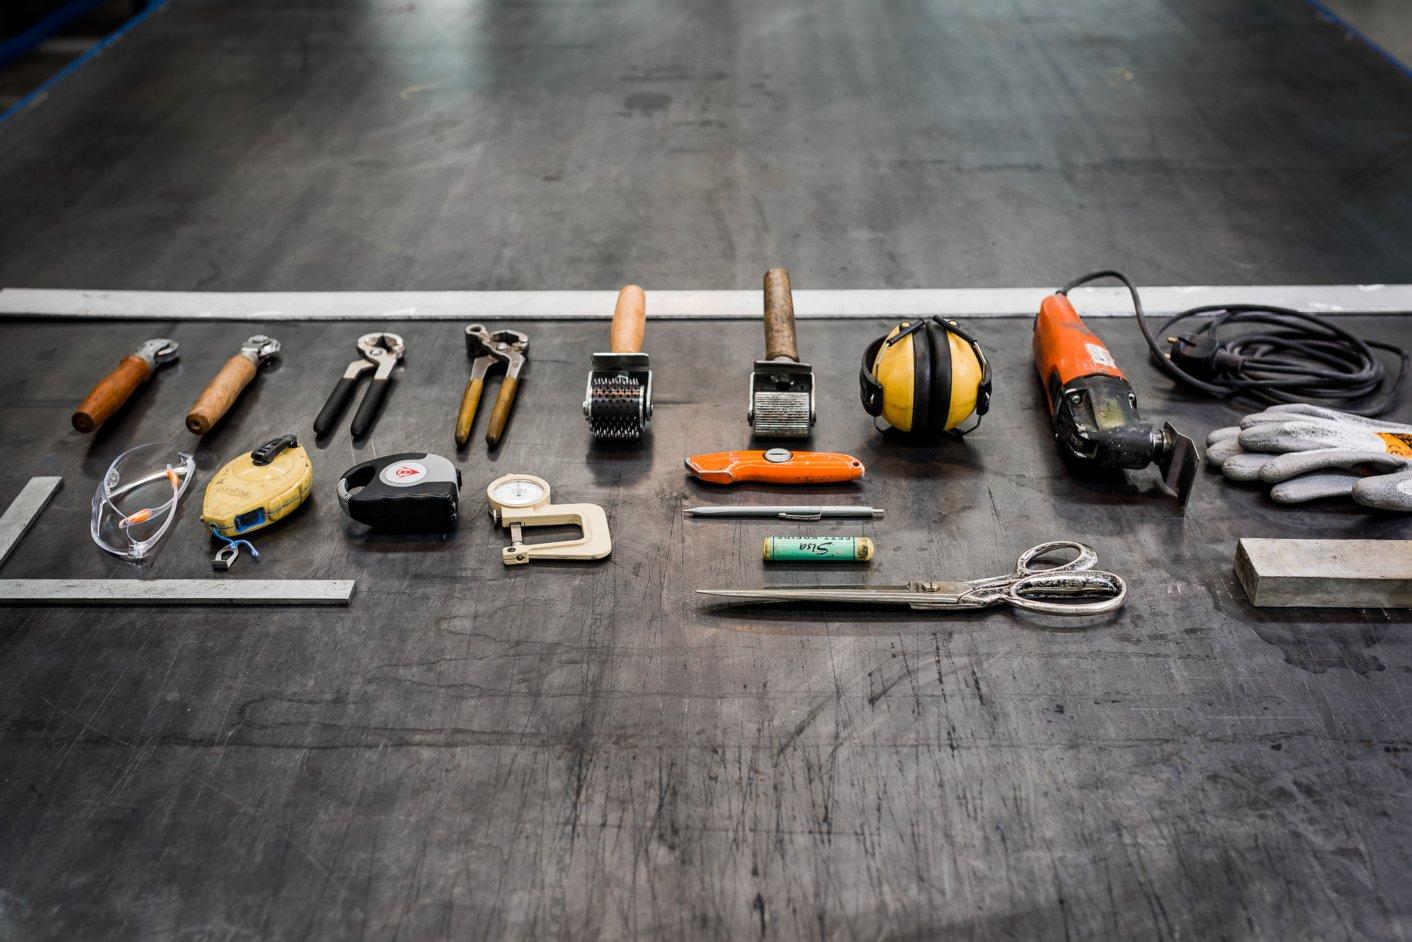 Splice Insights: The Equipment